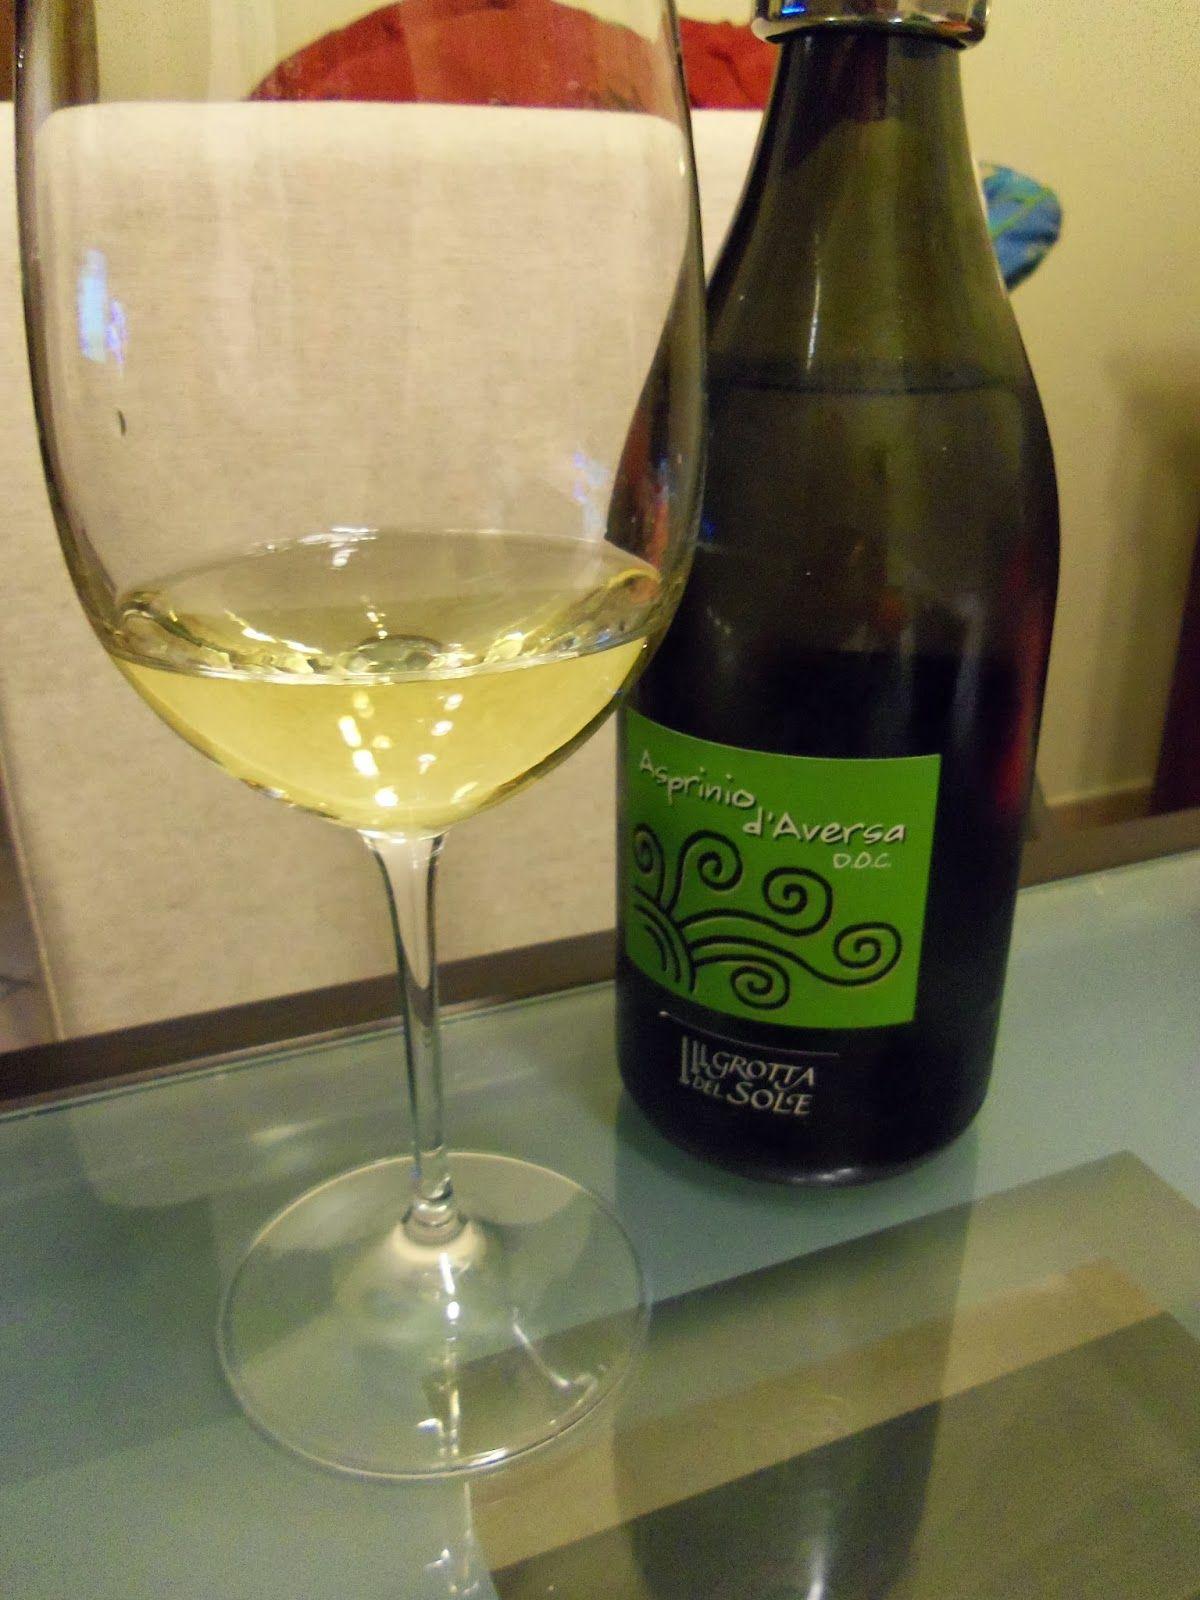 _______________________ -ITALIA-FOOD: il vino Asprinio di Aversa (Caserta)  by Francesco-Welcome and enjoy-  #WonderfulExpo2015  #Wonderfooditaly #MadeinItaly #slowfood #FrancescoBruno    @frbrun  http://www.blogtematico.it   frbrun@tiscali.it    http://www.francoingbruno.it   #Basilicata